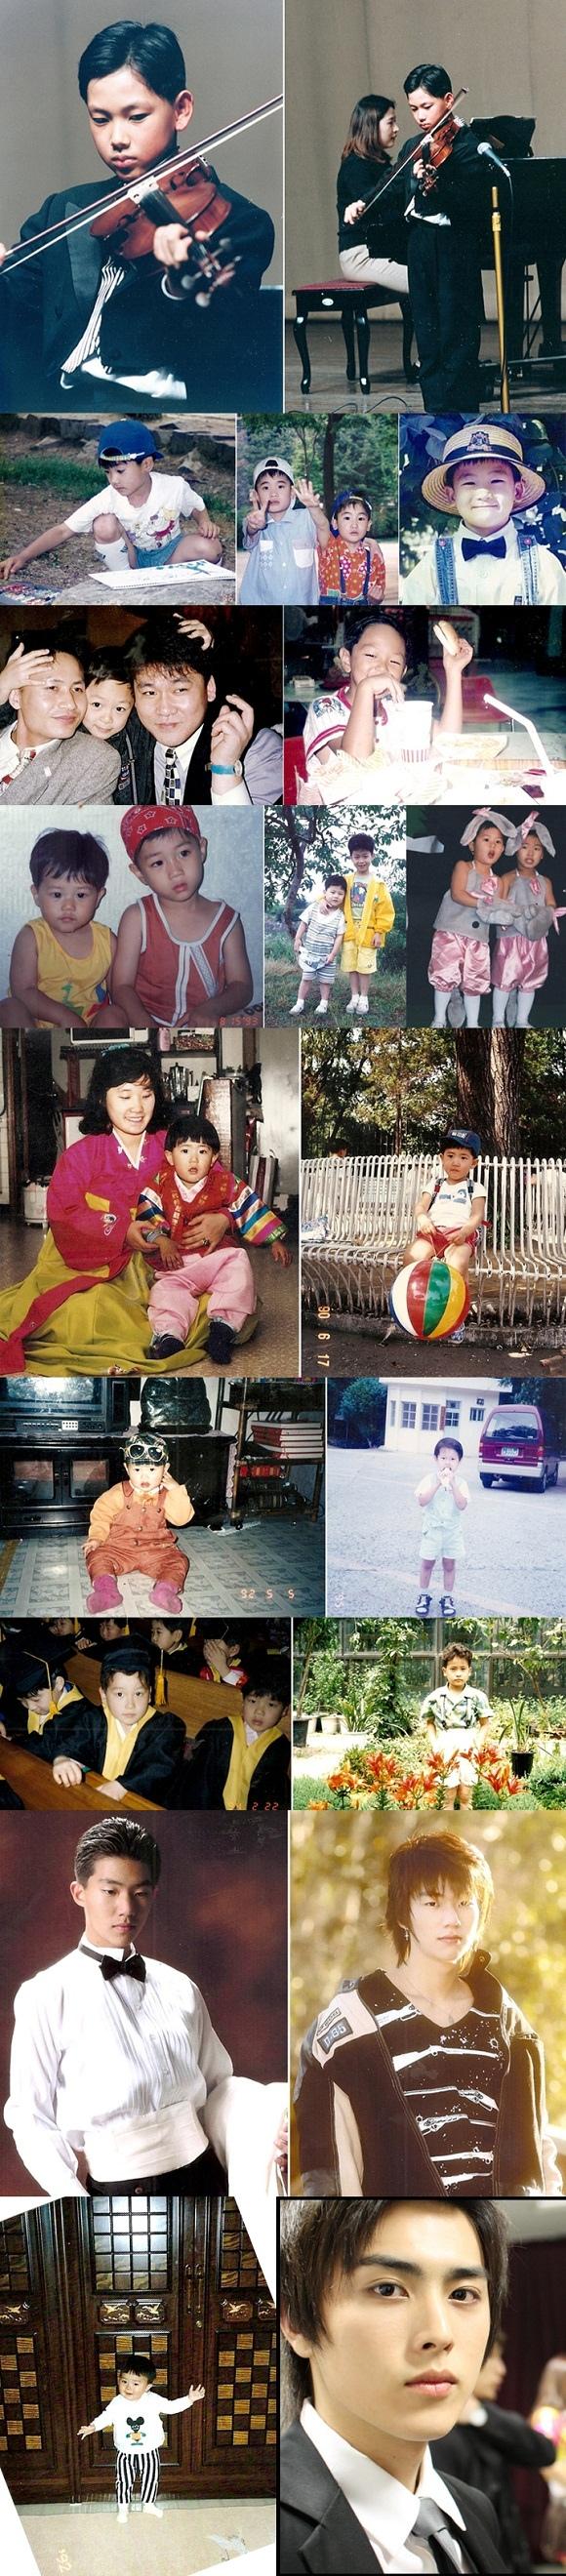 ZEA帝國之子 幼年時期照片公開,「全員都是天生美男 認證」